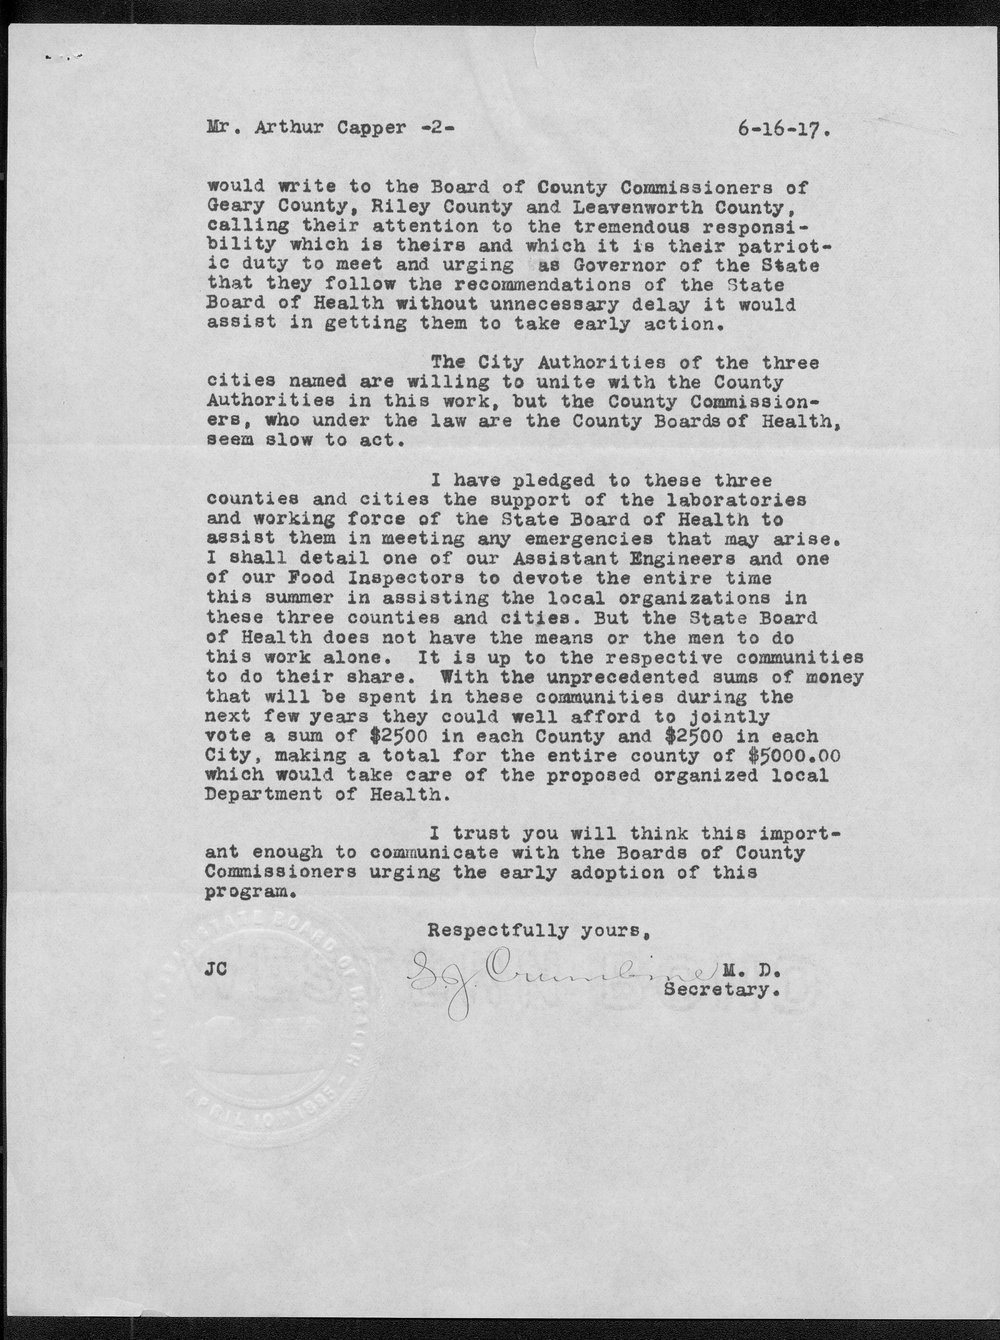 Samuel Crumbine to Governor Arthur Capper - 2